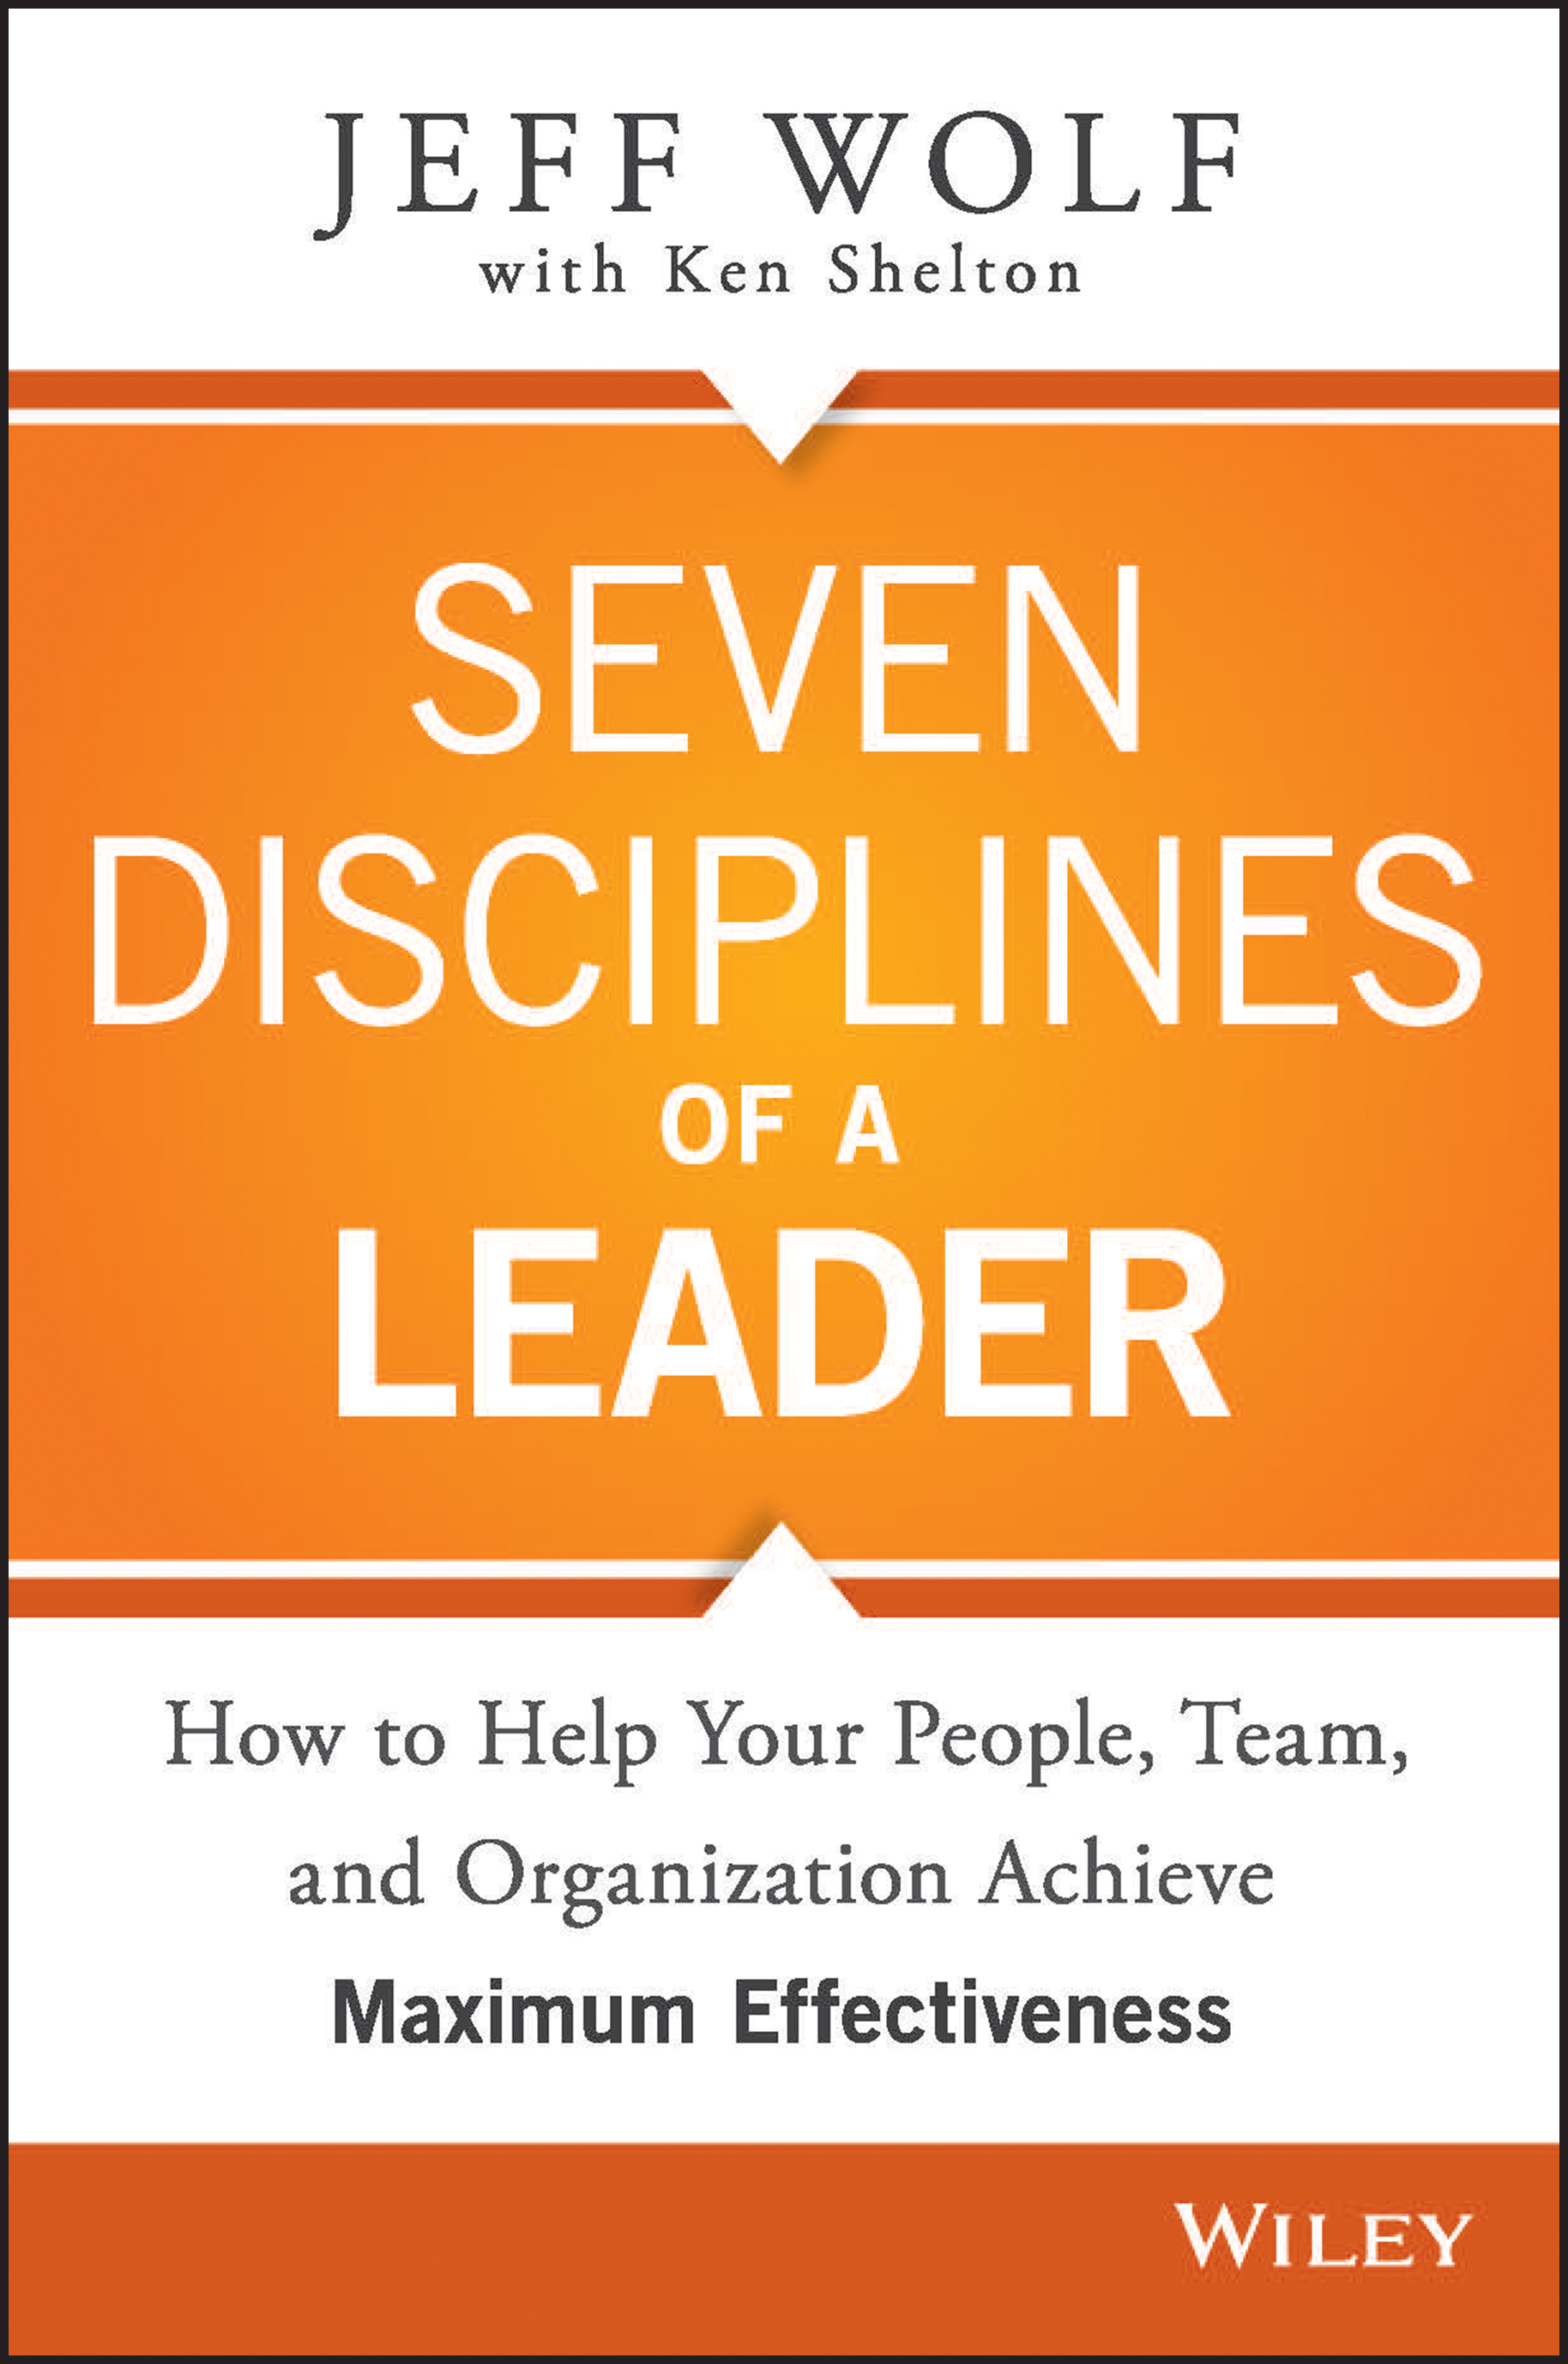 6 Essential Leadership Responsibilities That Build